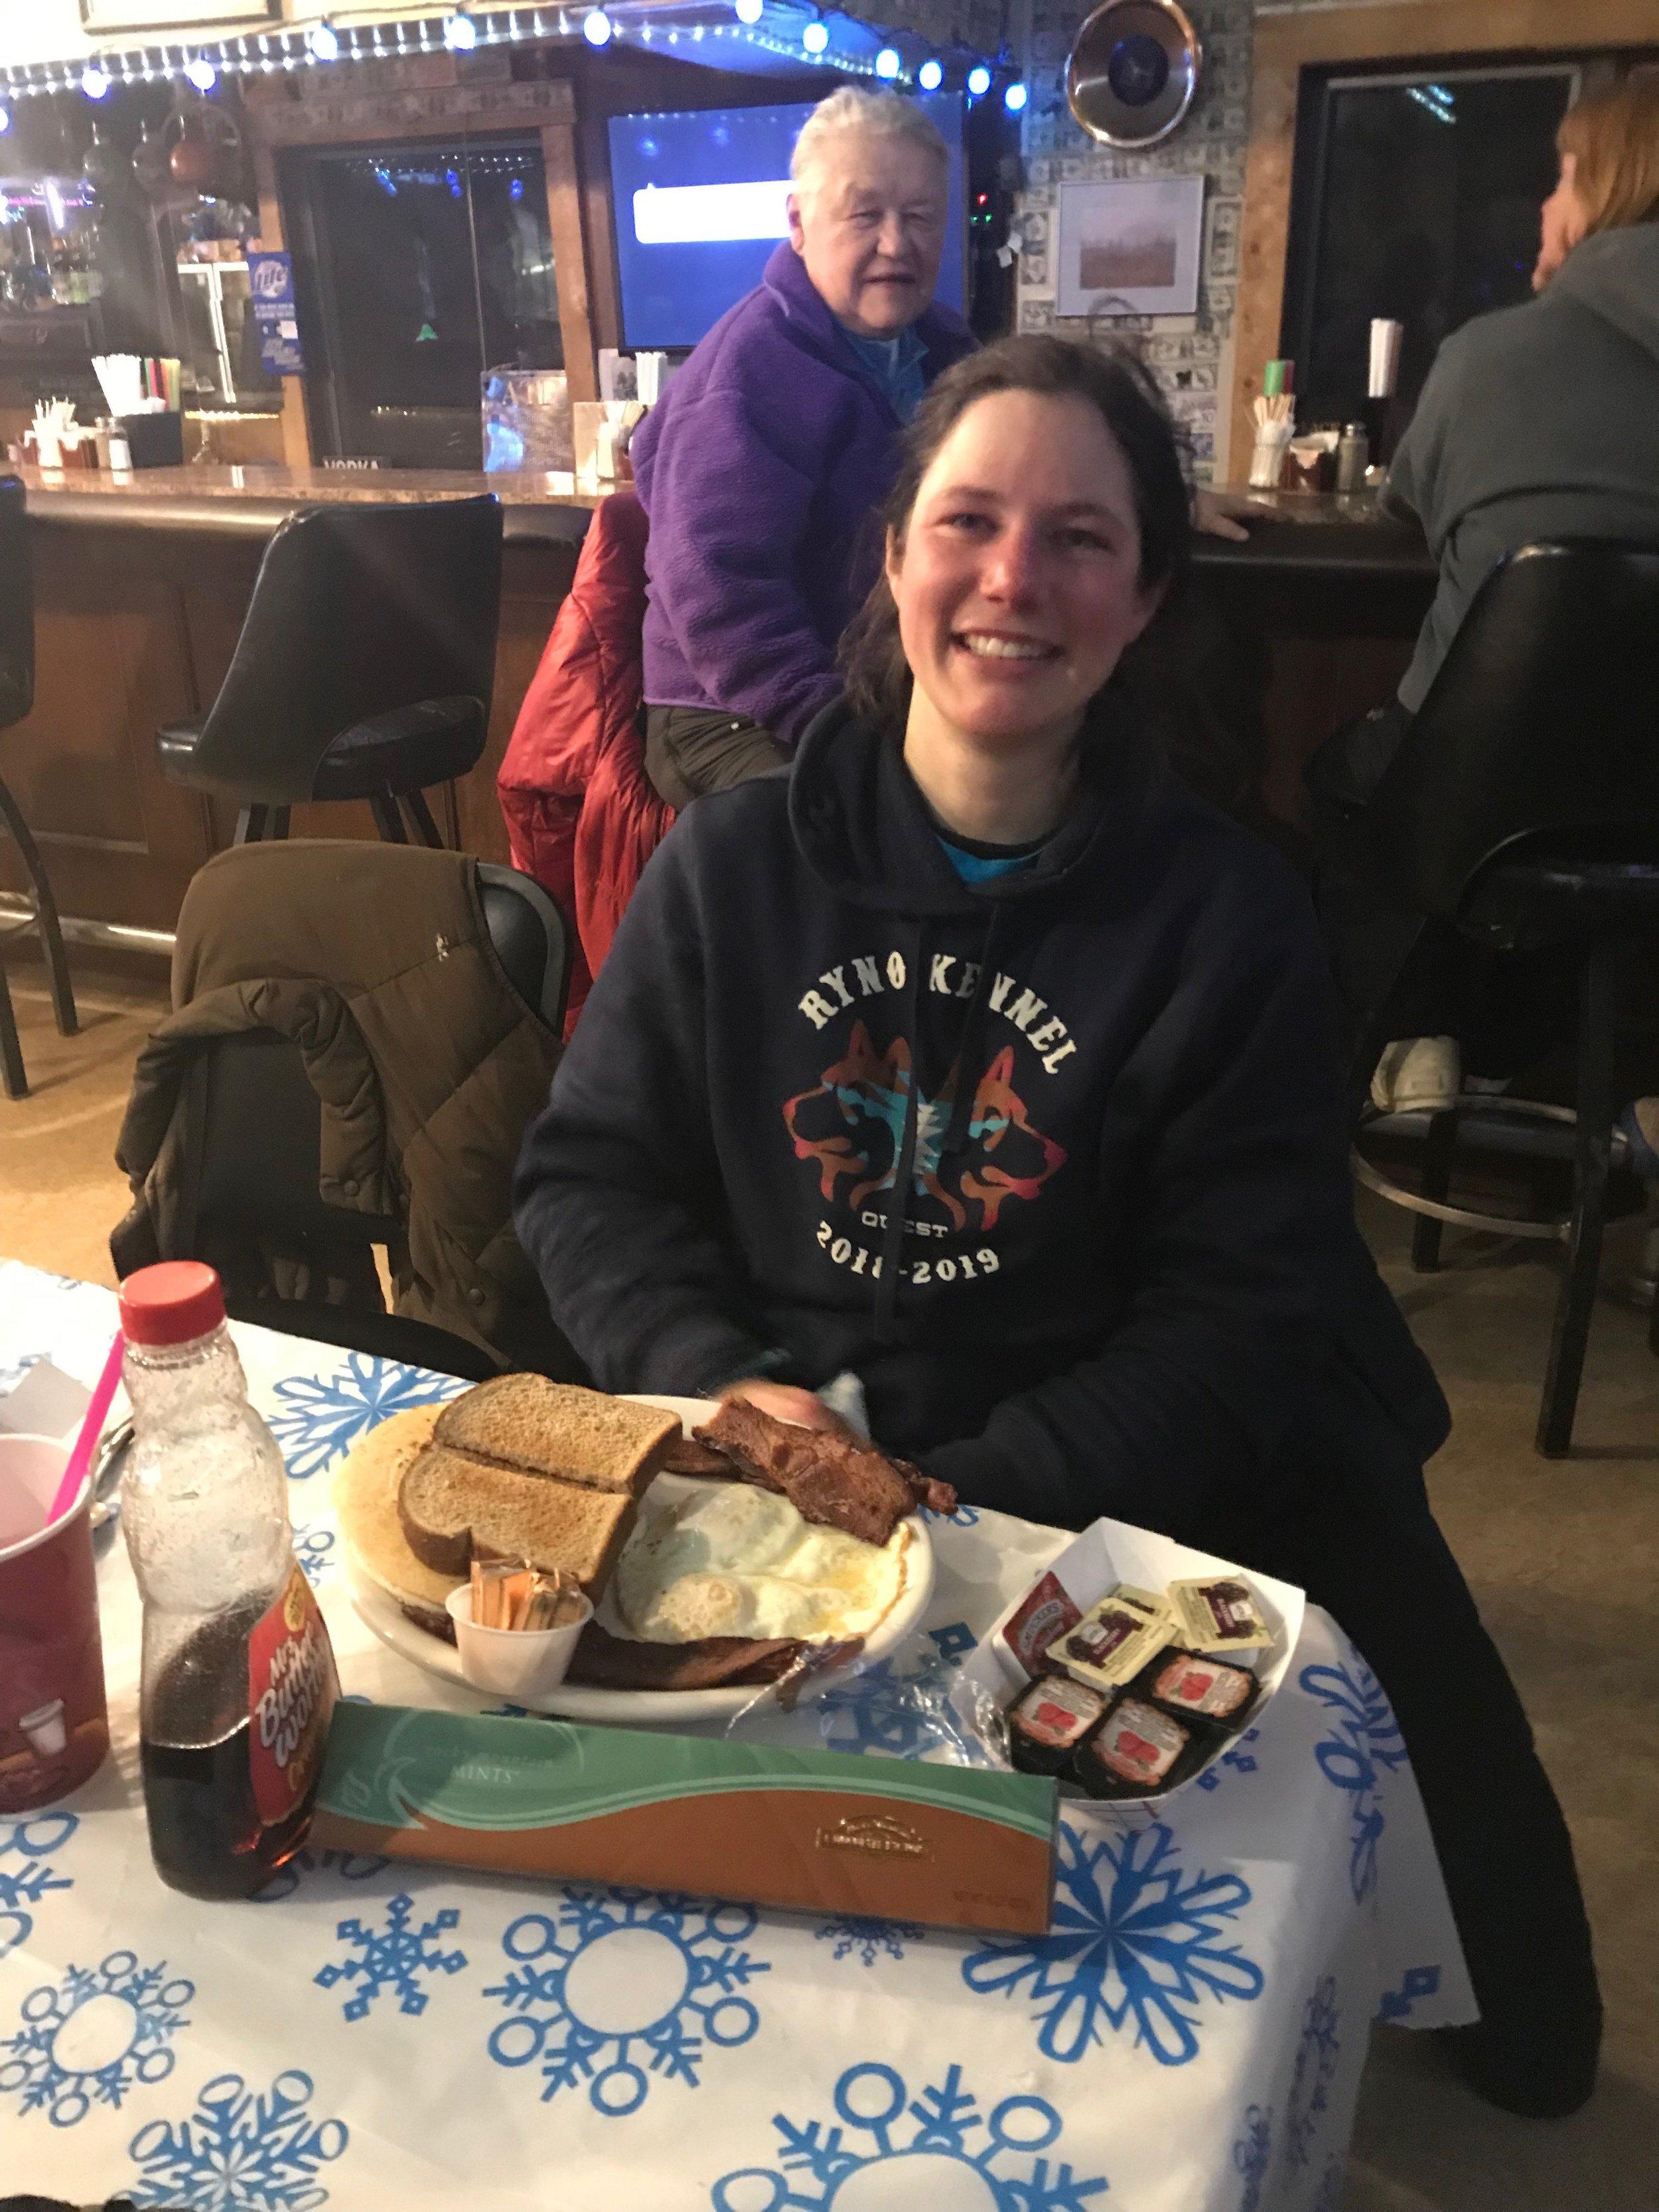 Birthday breakfast in Central — #30!